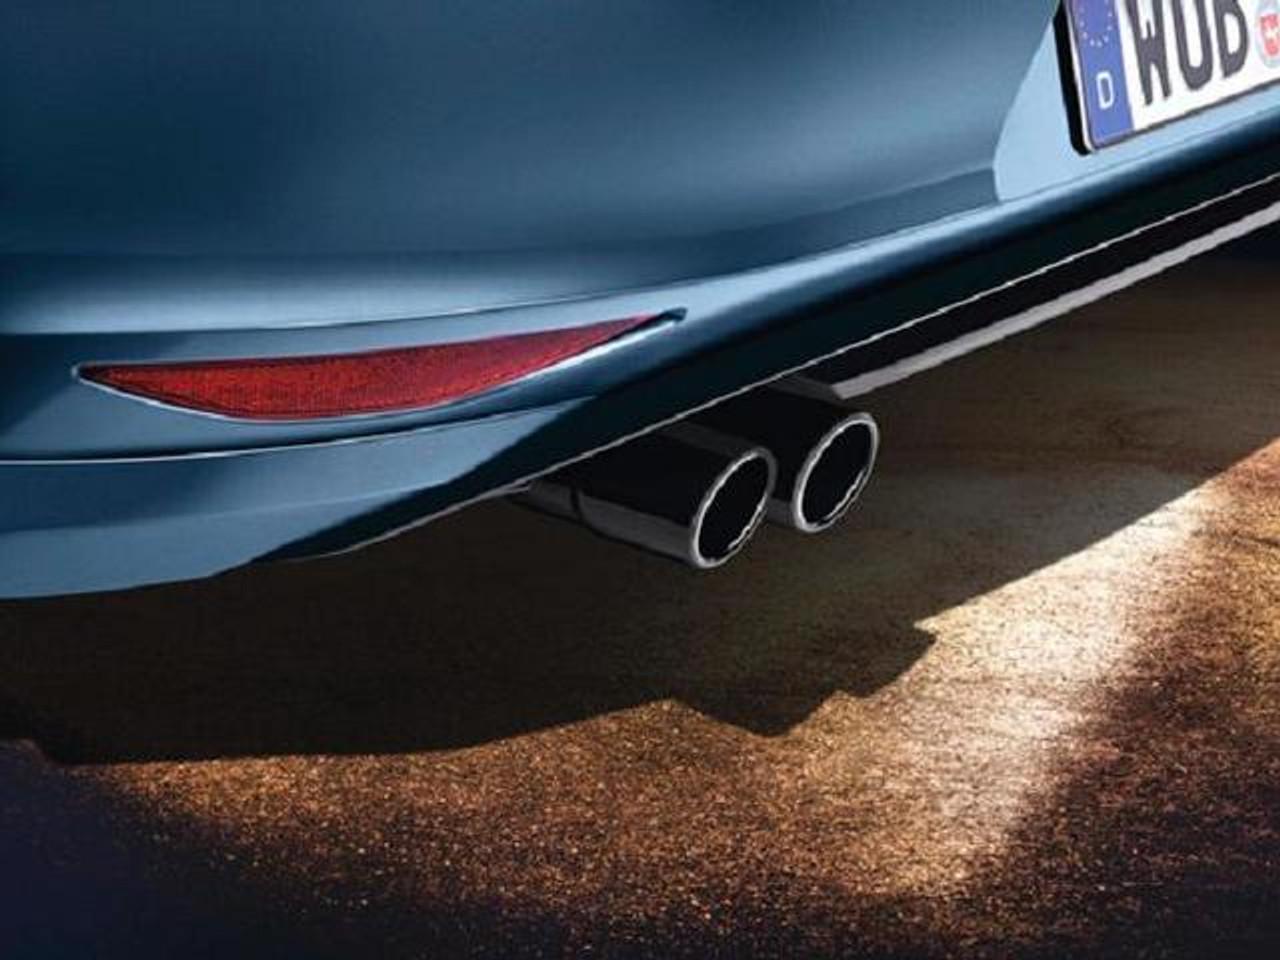 2011-2018 VW Jetta Black Stainless Steel Exhaust Tips